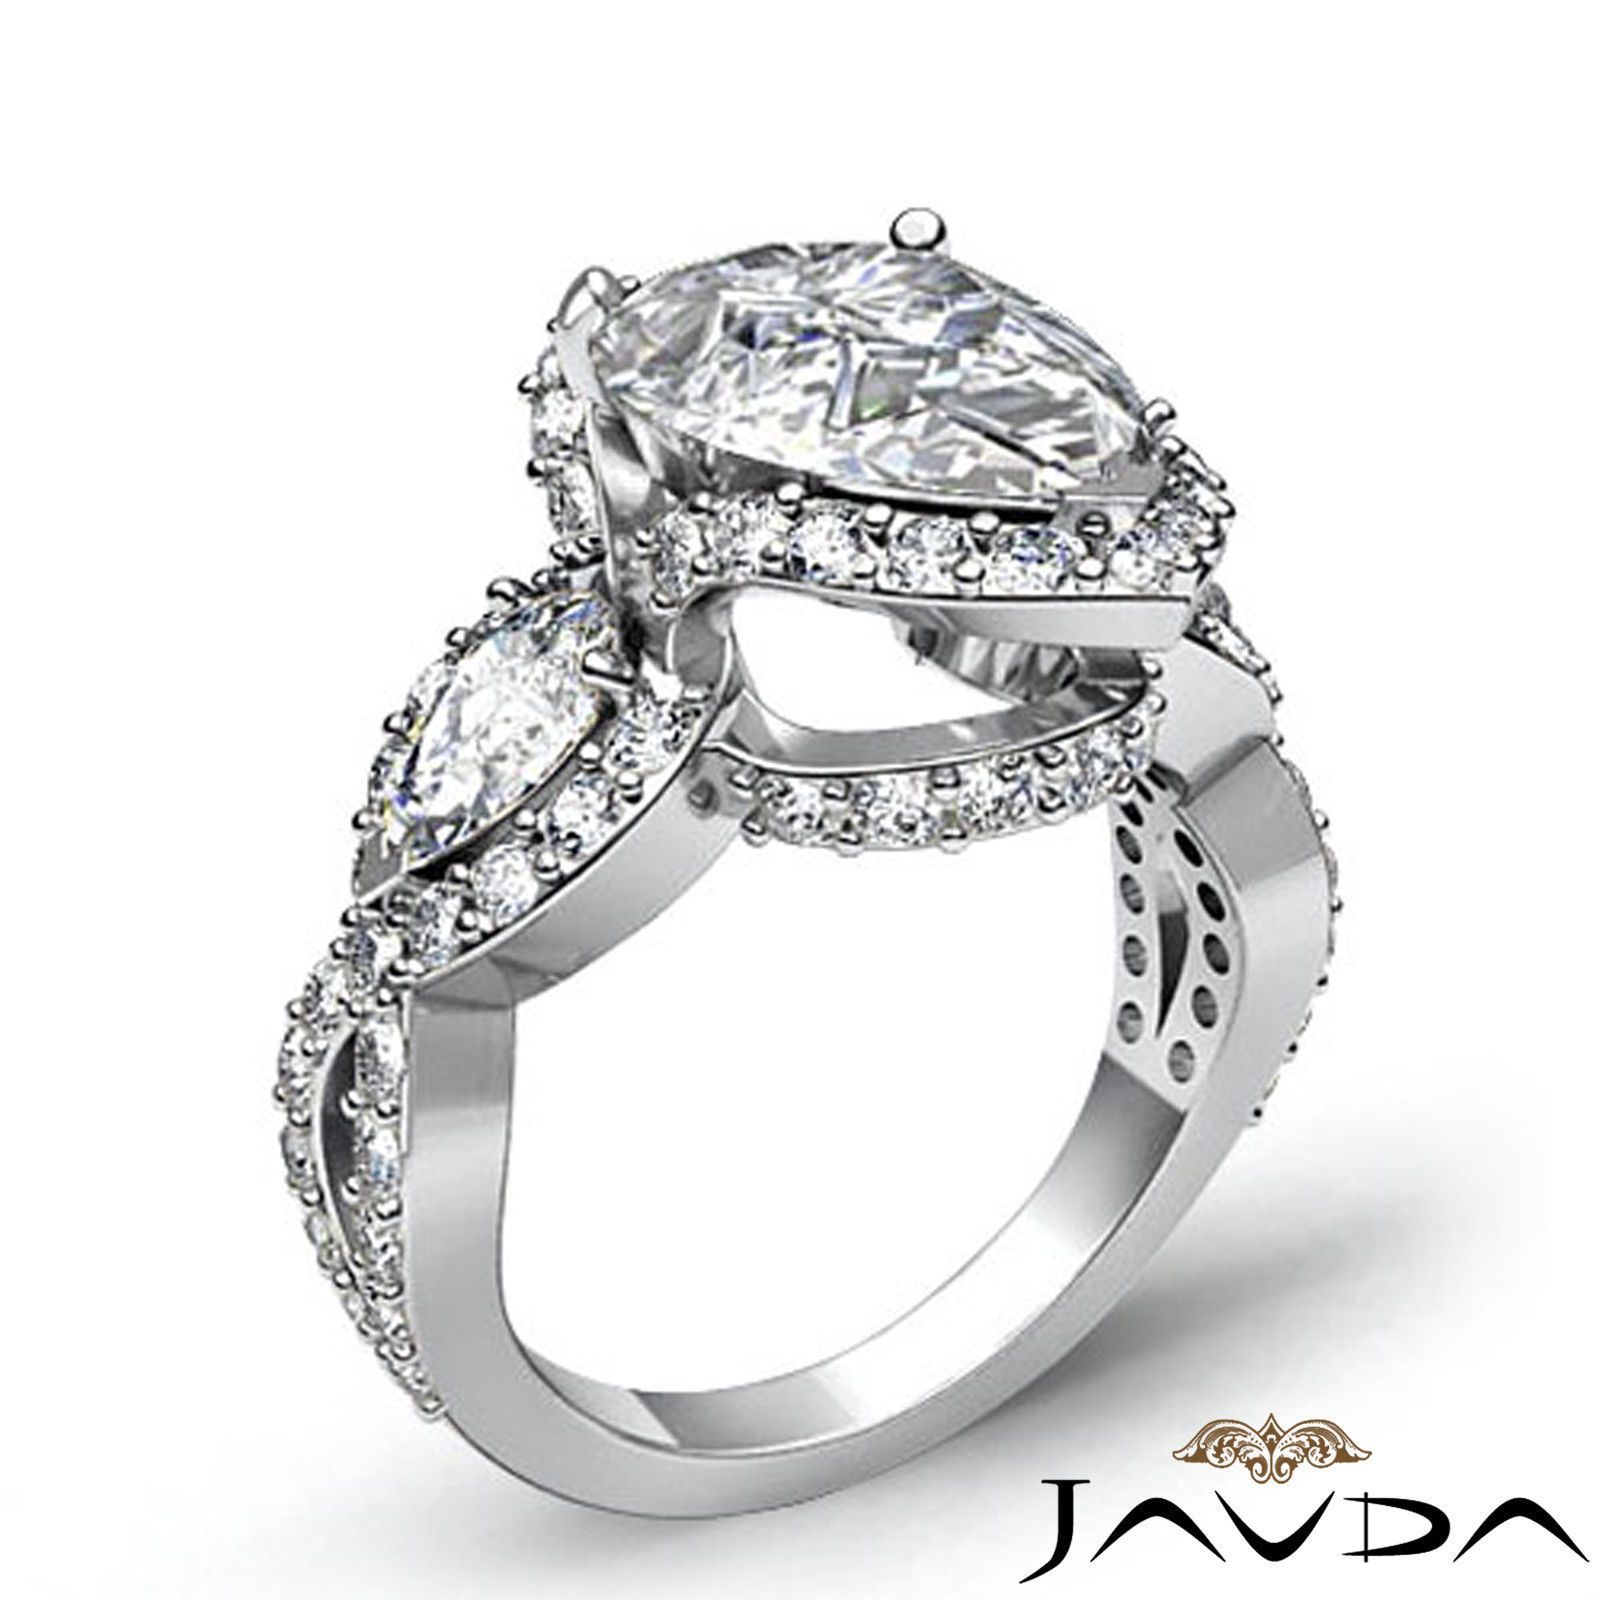 Pear diamond stone crosss shank engagement ring gia h si k